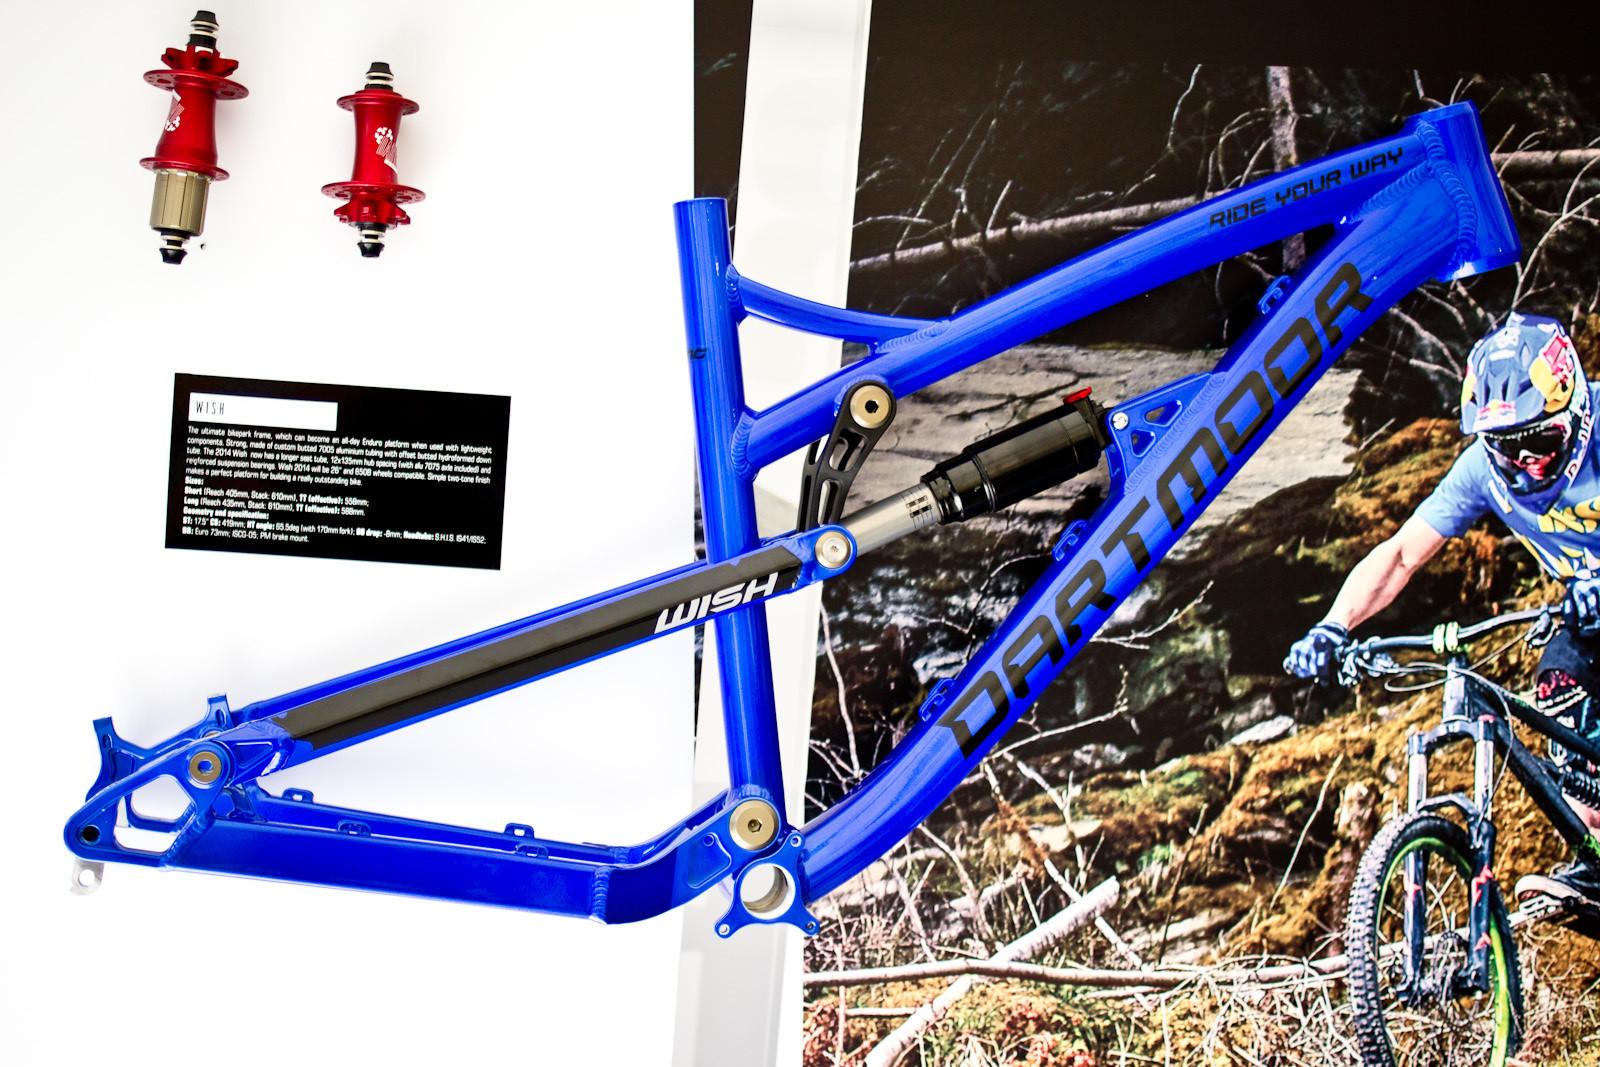 2014 Dartmoor Wish - 2014 Trail, All-Mountain & Enduro Bikes at Eurobike 2013 - Mountain Biking Pictures - Vital MTB